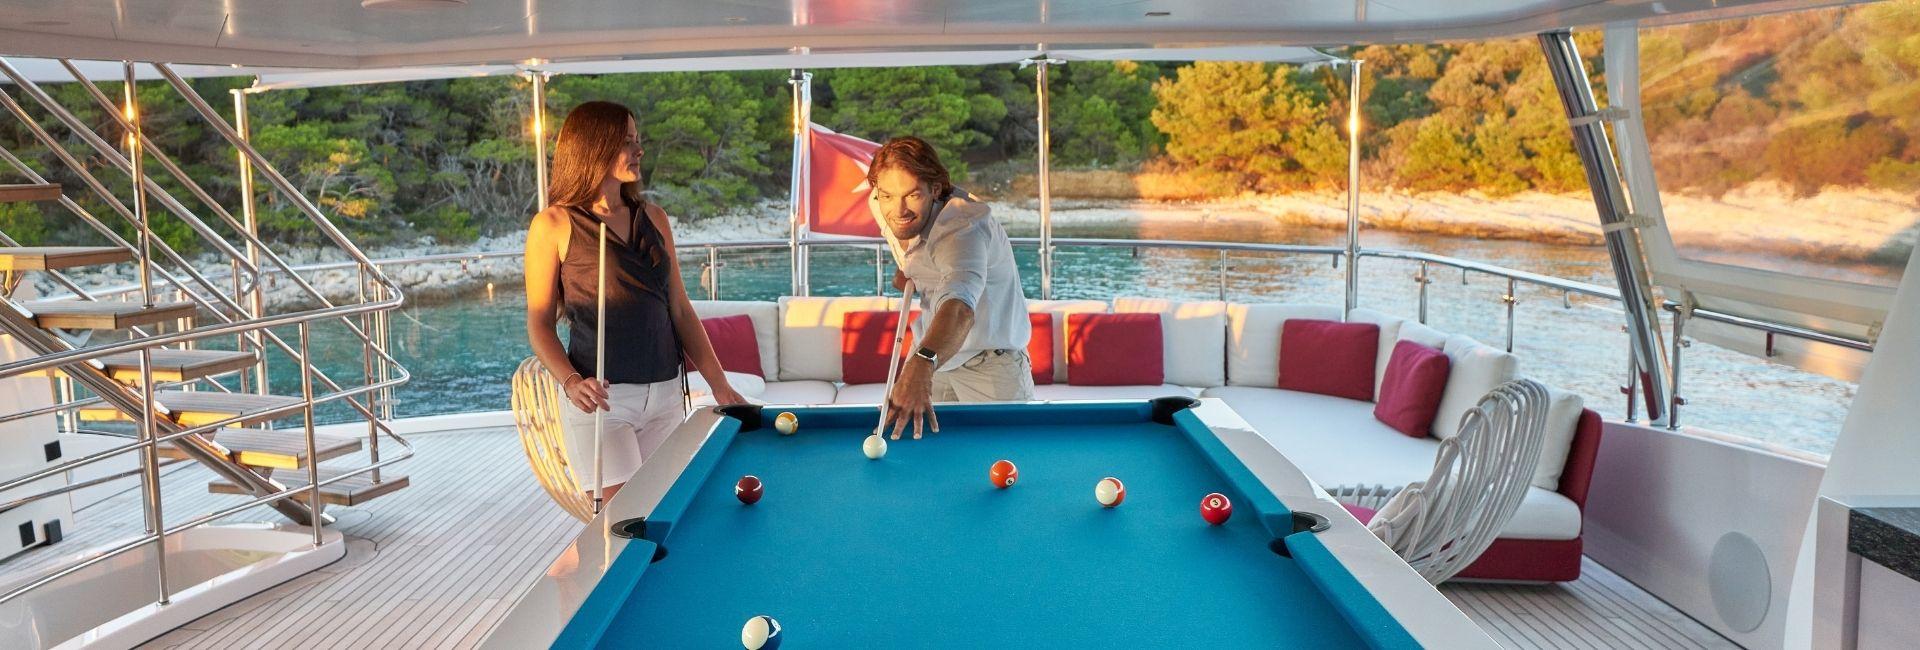 Billiard for yacht luxury - Billards Toulet